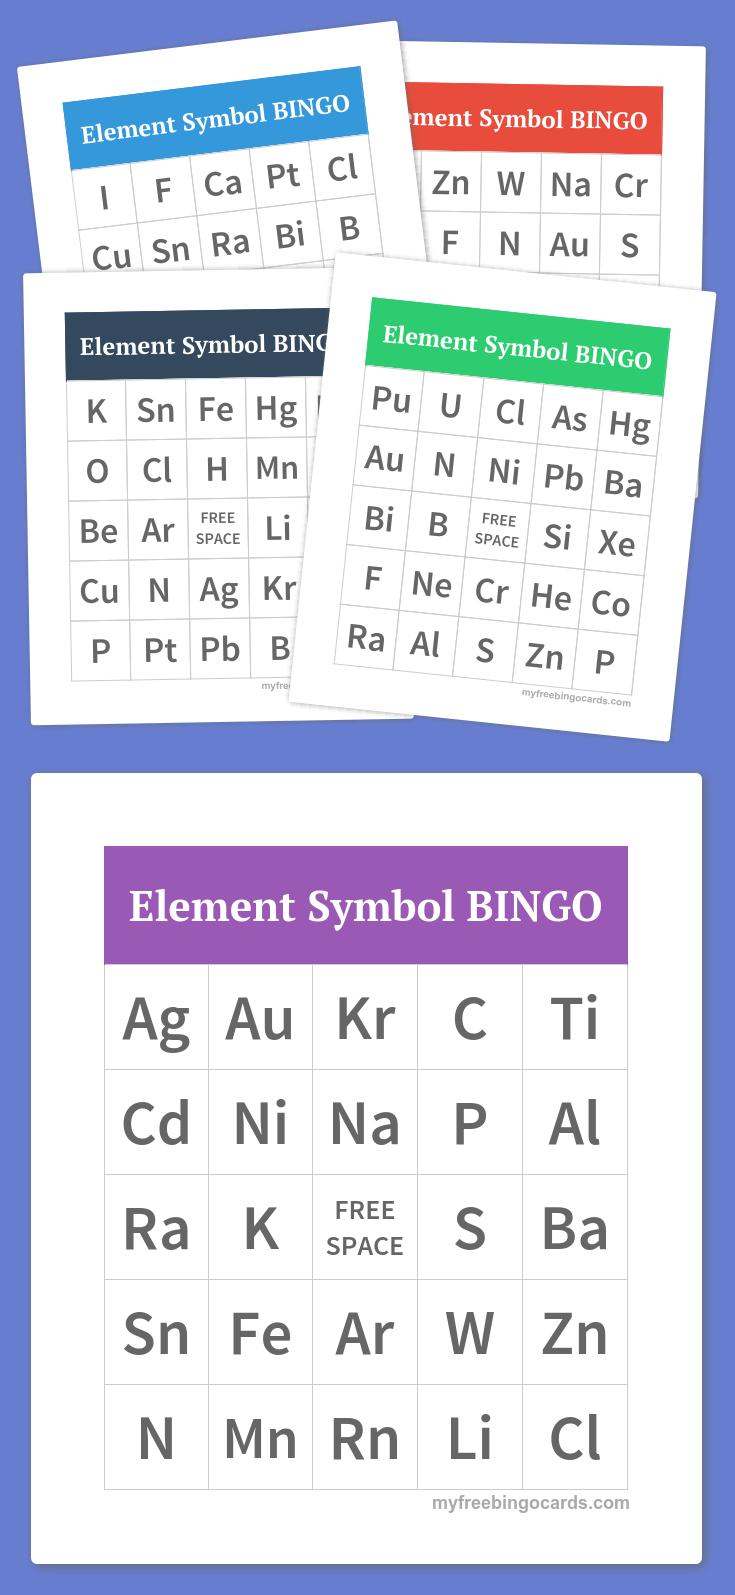 Periodic Table Element Symbol Bingo   The Periodic Table   Pinterest - Free Printable Bingo Cards For Teachers